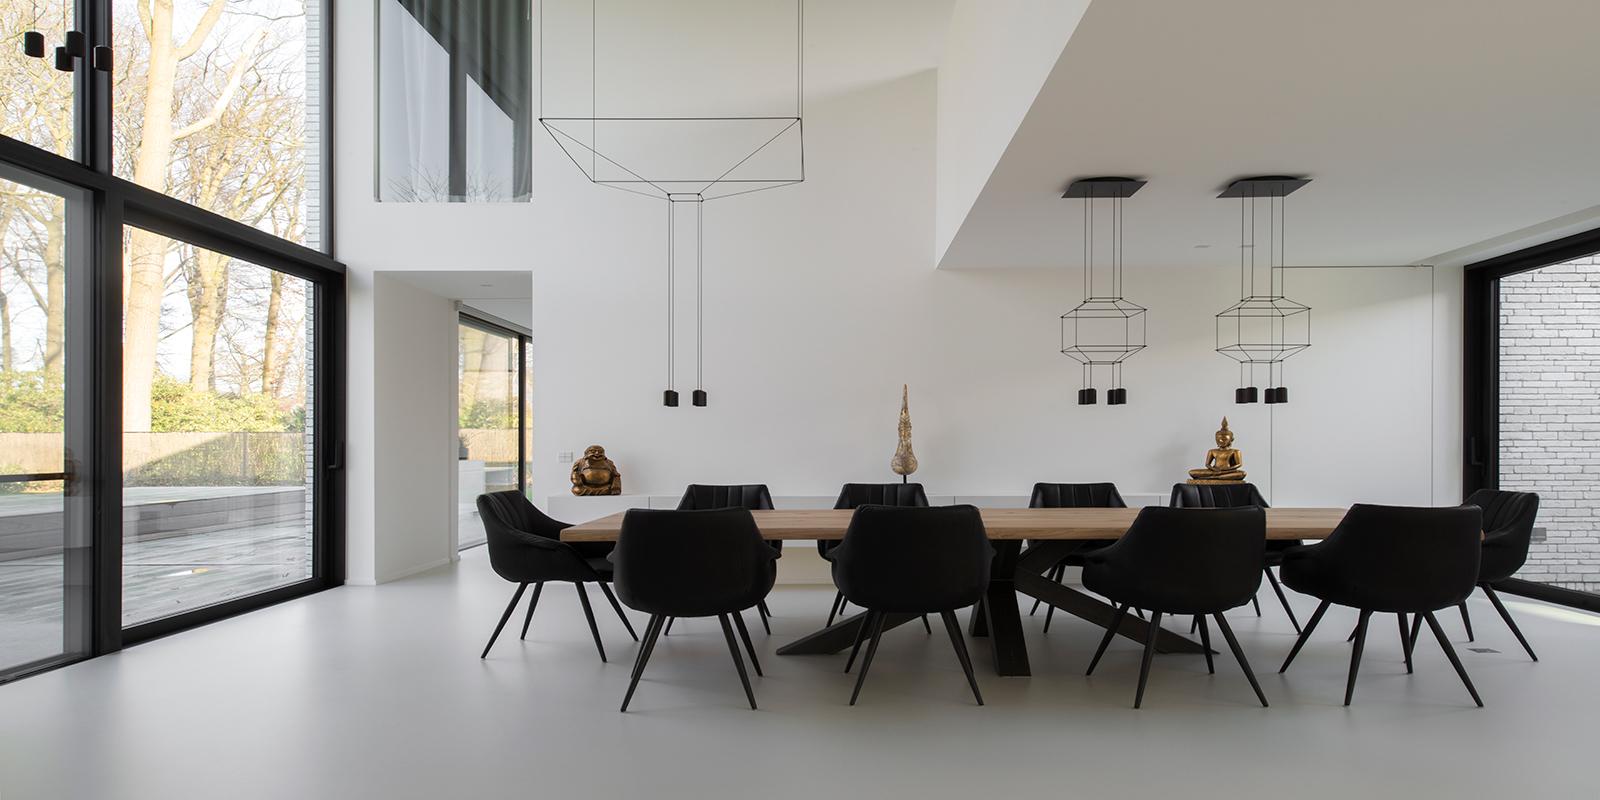 Gietvloer, Strak, Exclusief, interieur